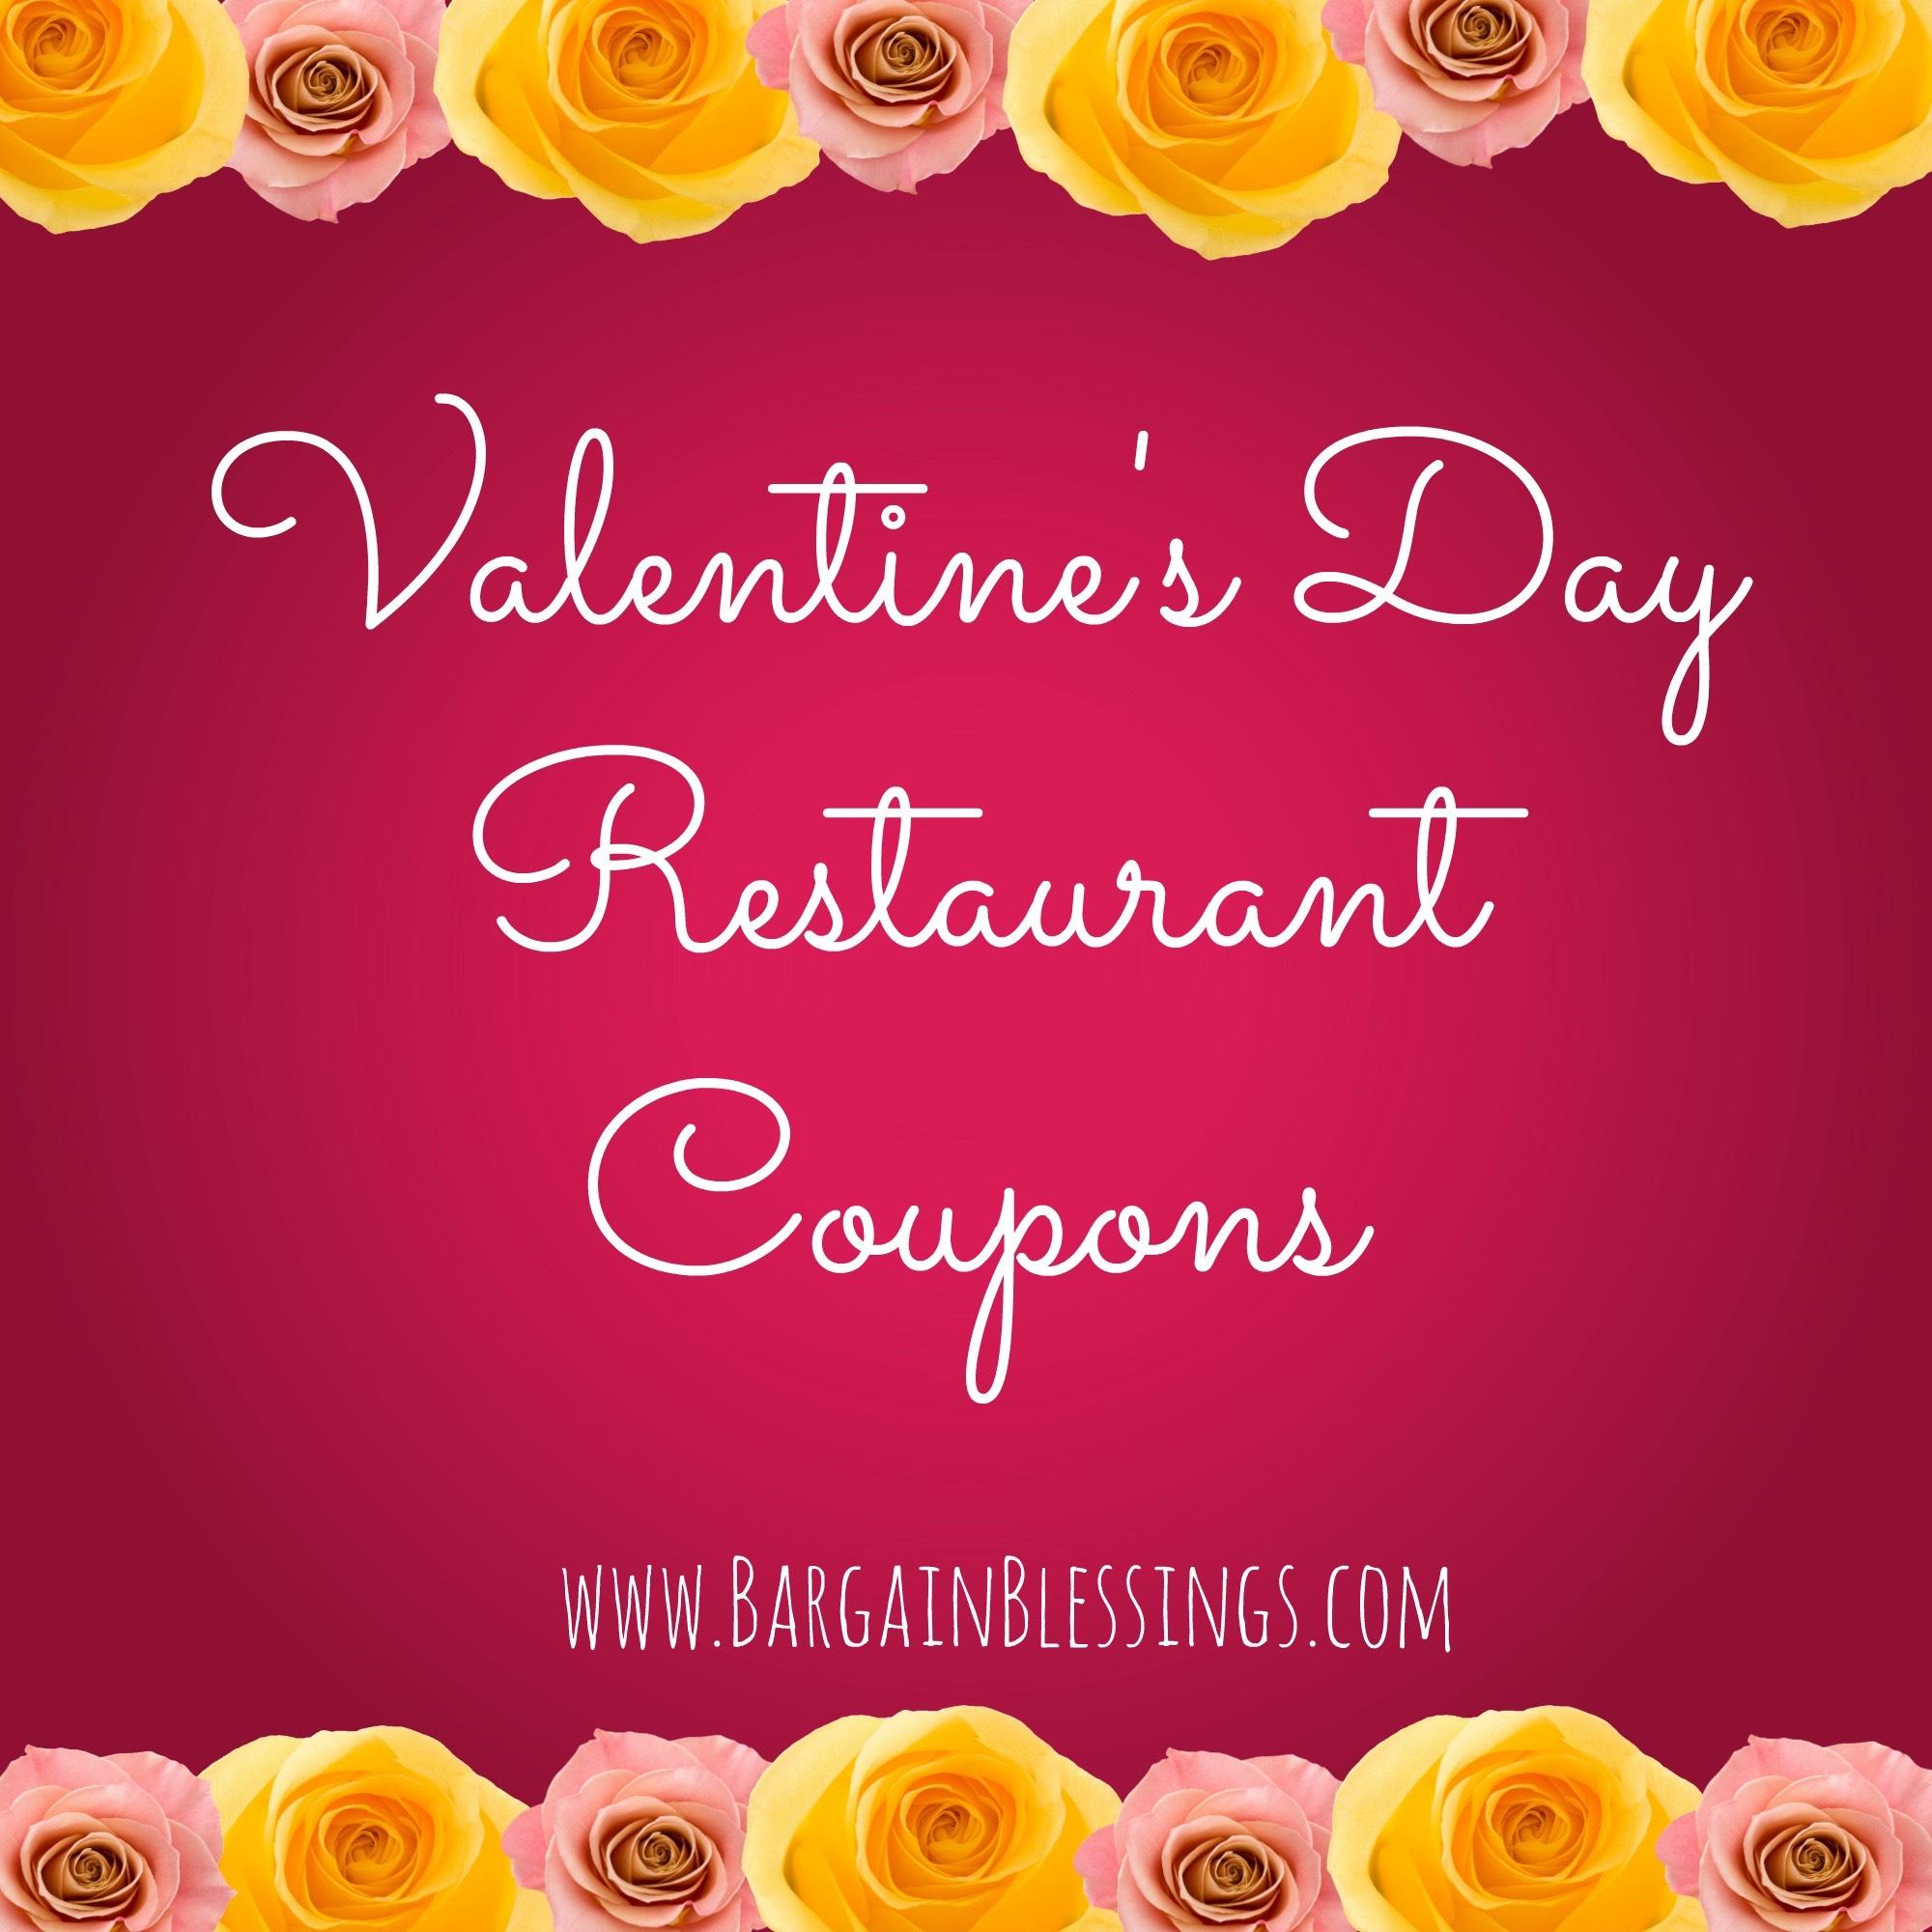 Restaurant coupons valentine's day